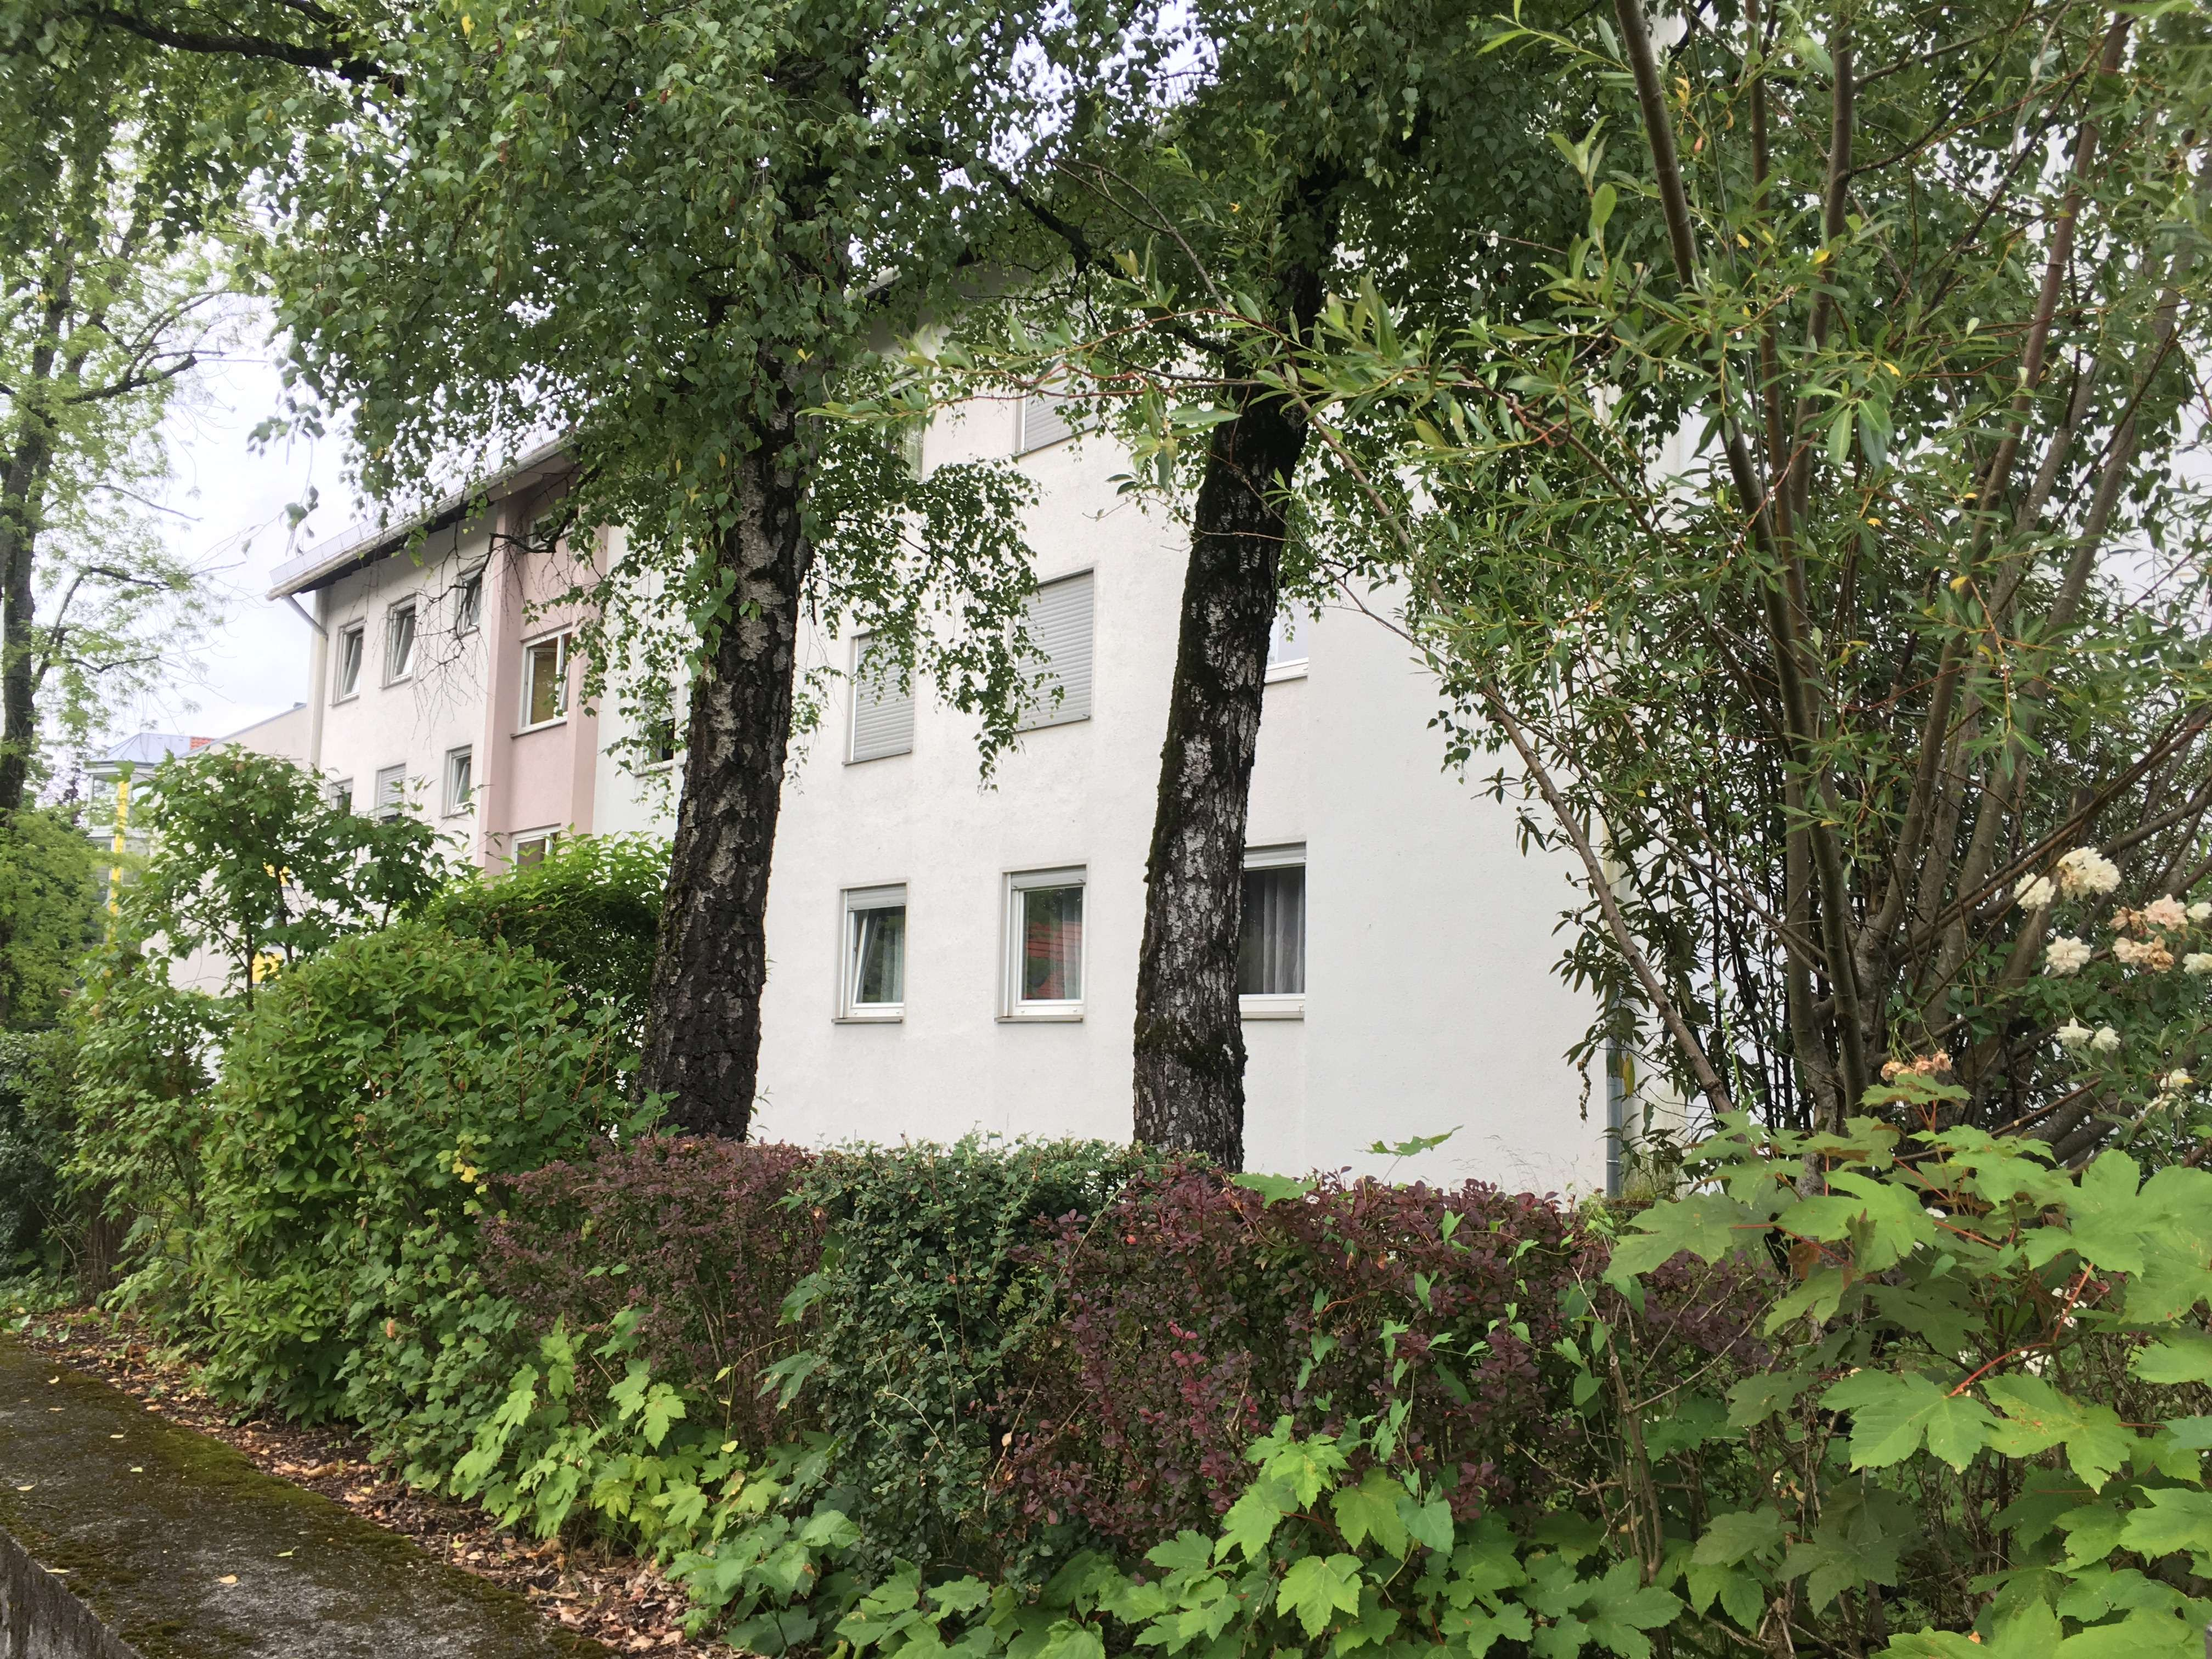 Großzügig geschnittene 4 Zi-Whg in Stockdorf (S6) an der Würm! in Gauting